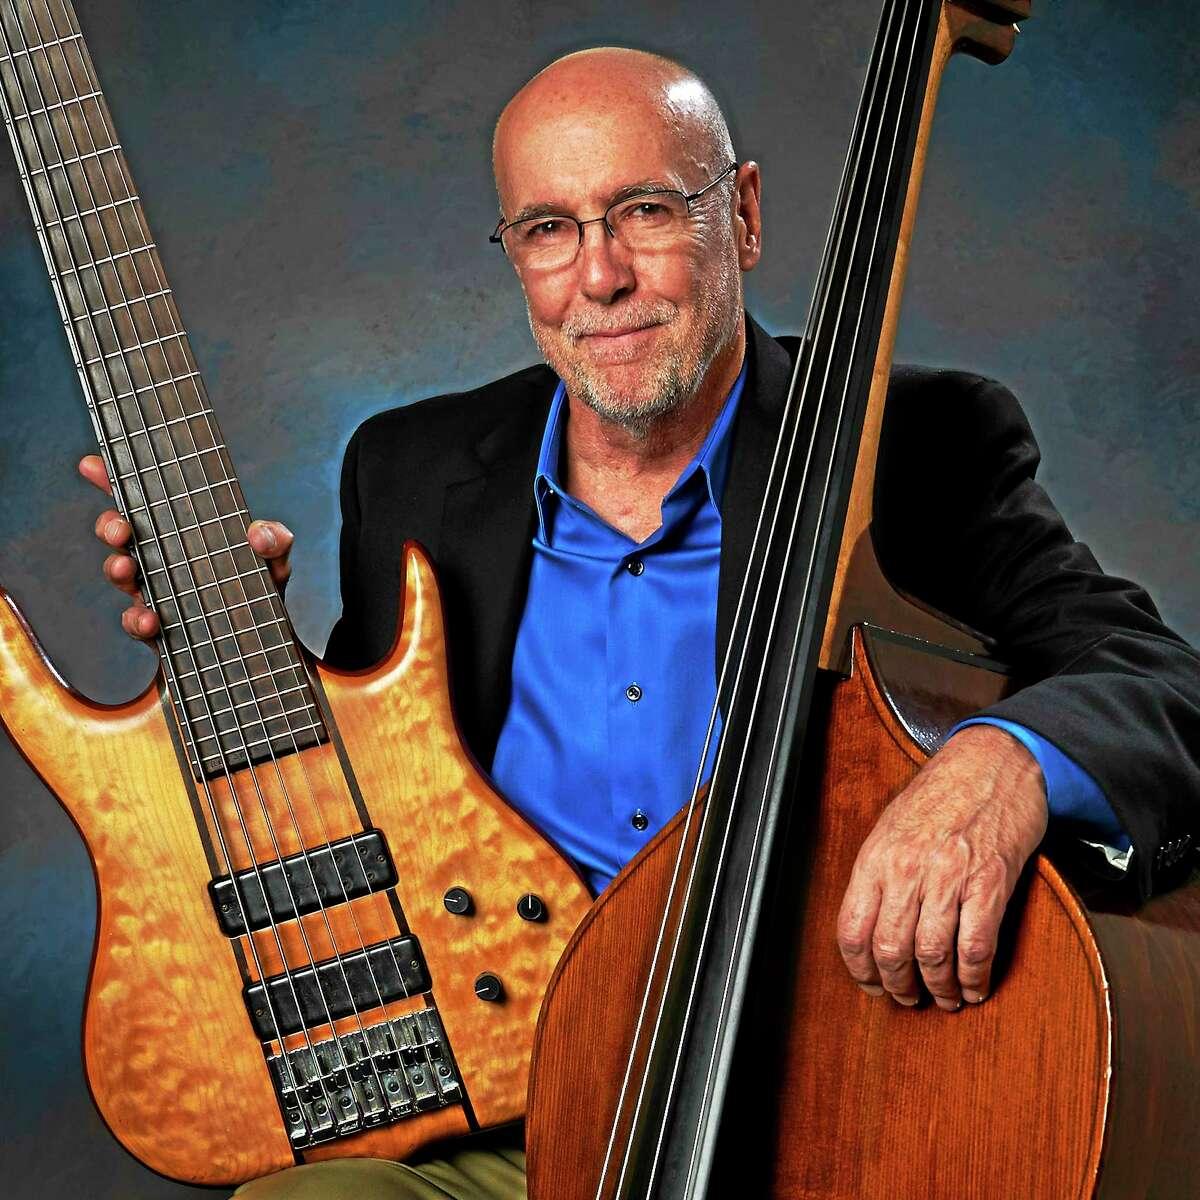 Composer/bassist Jeff Fuller directs the Neighborhood Music School's Premier Jazz Ensemble.